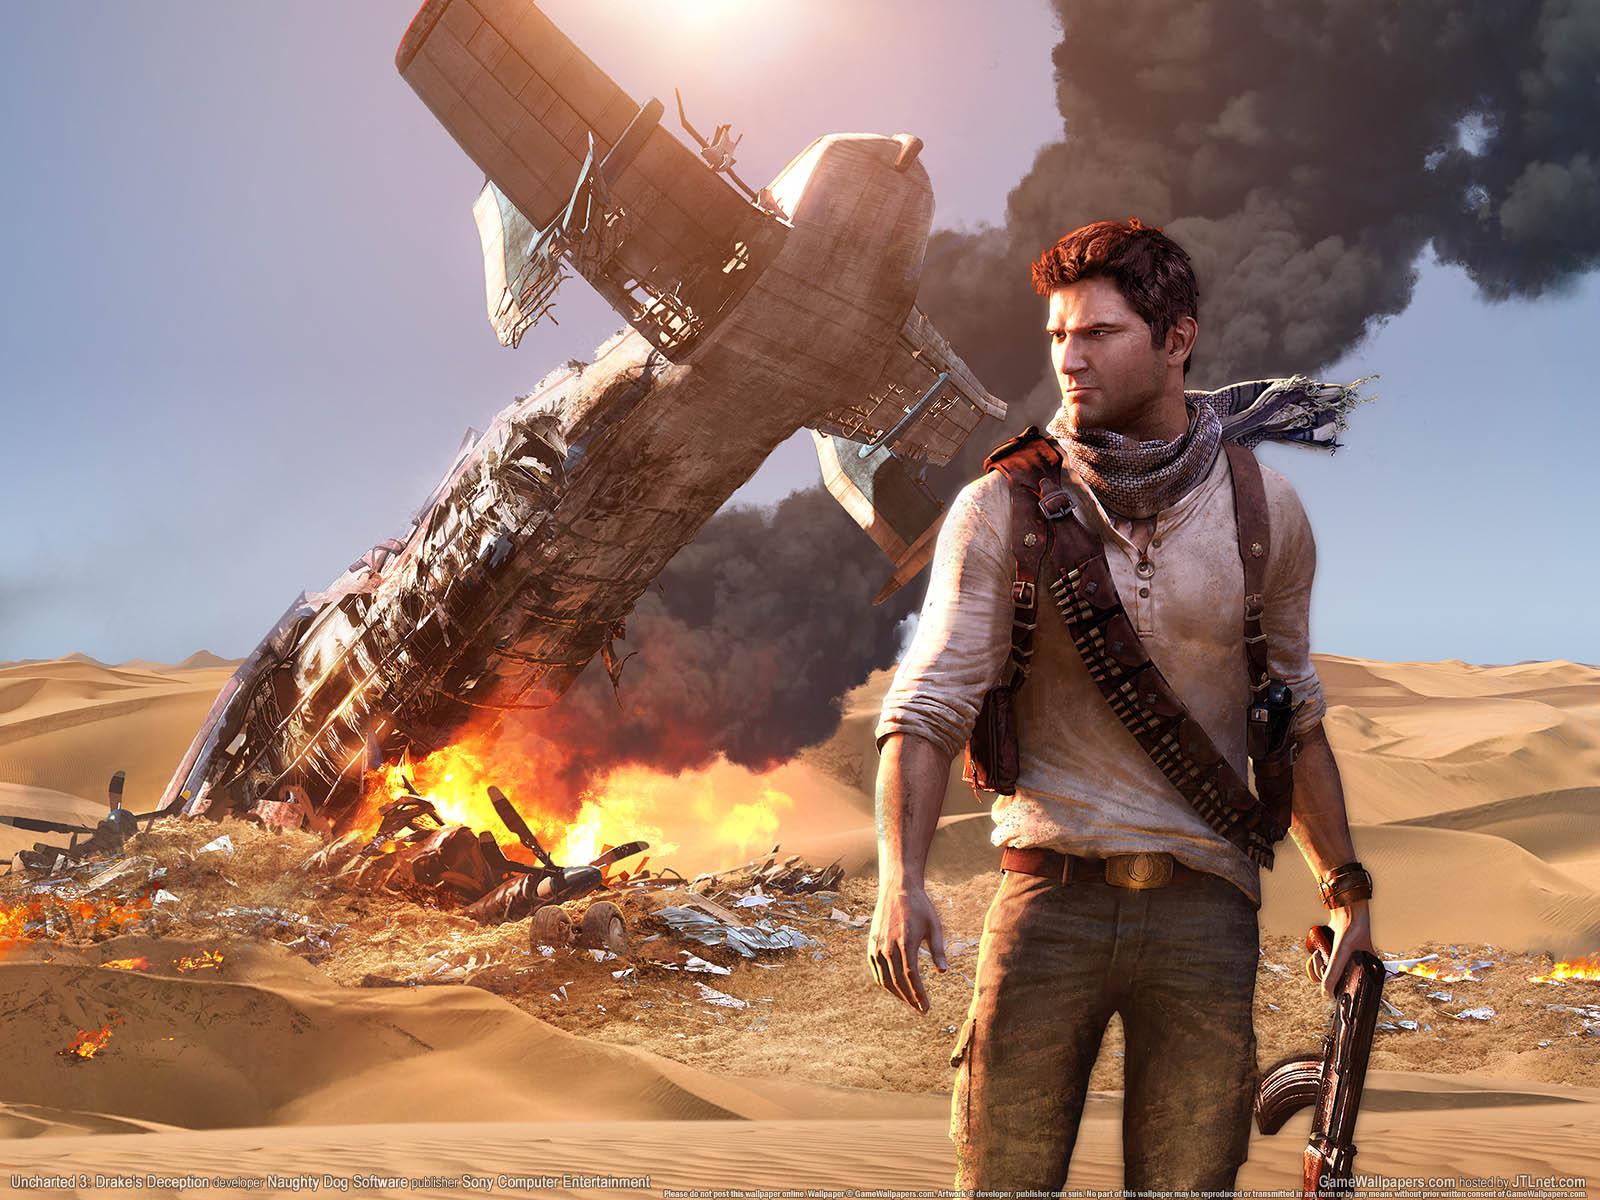 Uncharted 3: Drake's Deceptionνmmer=01 achtergrond  1600x1200